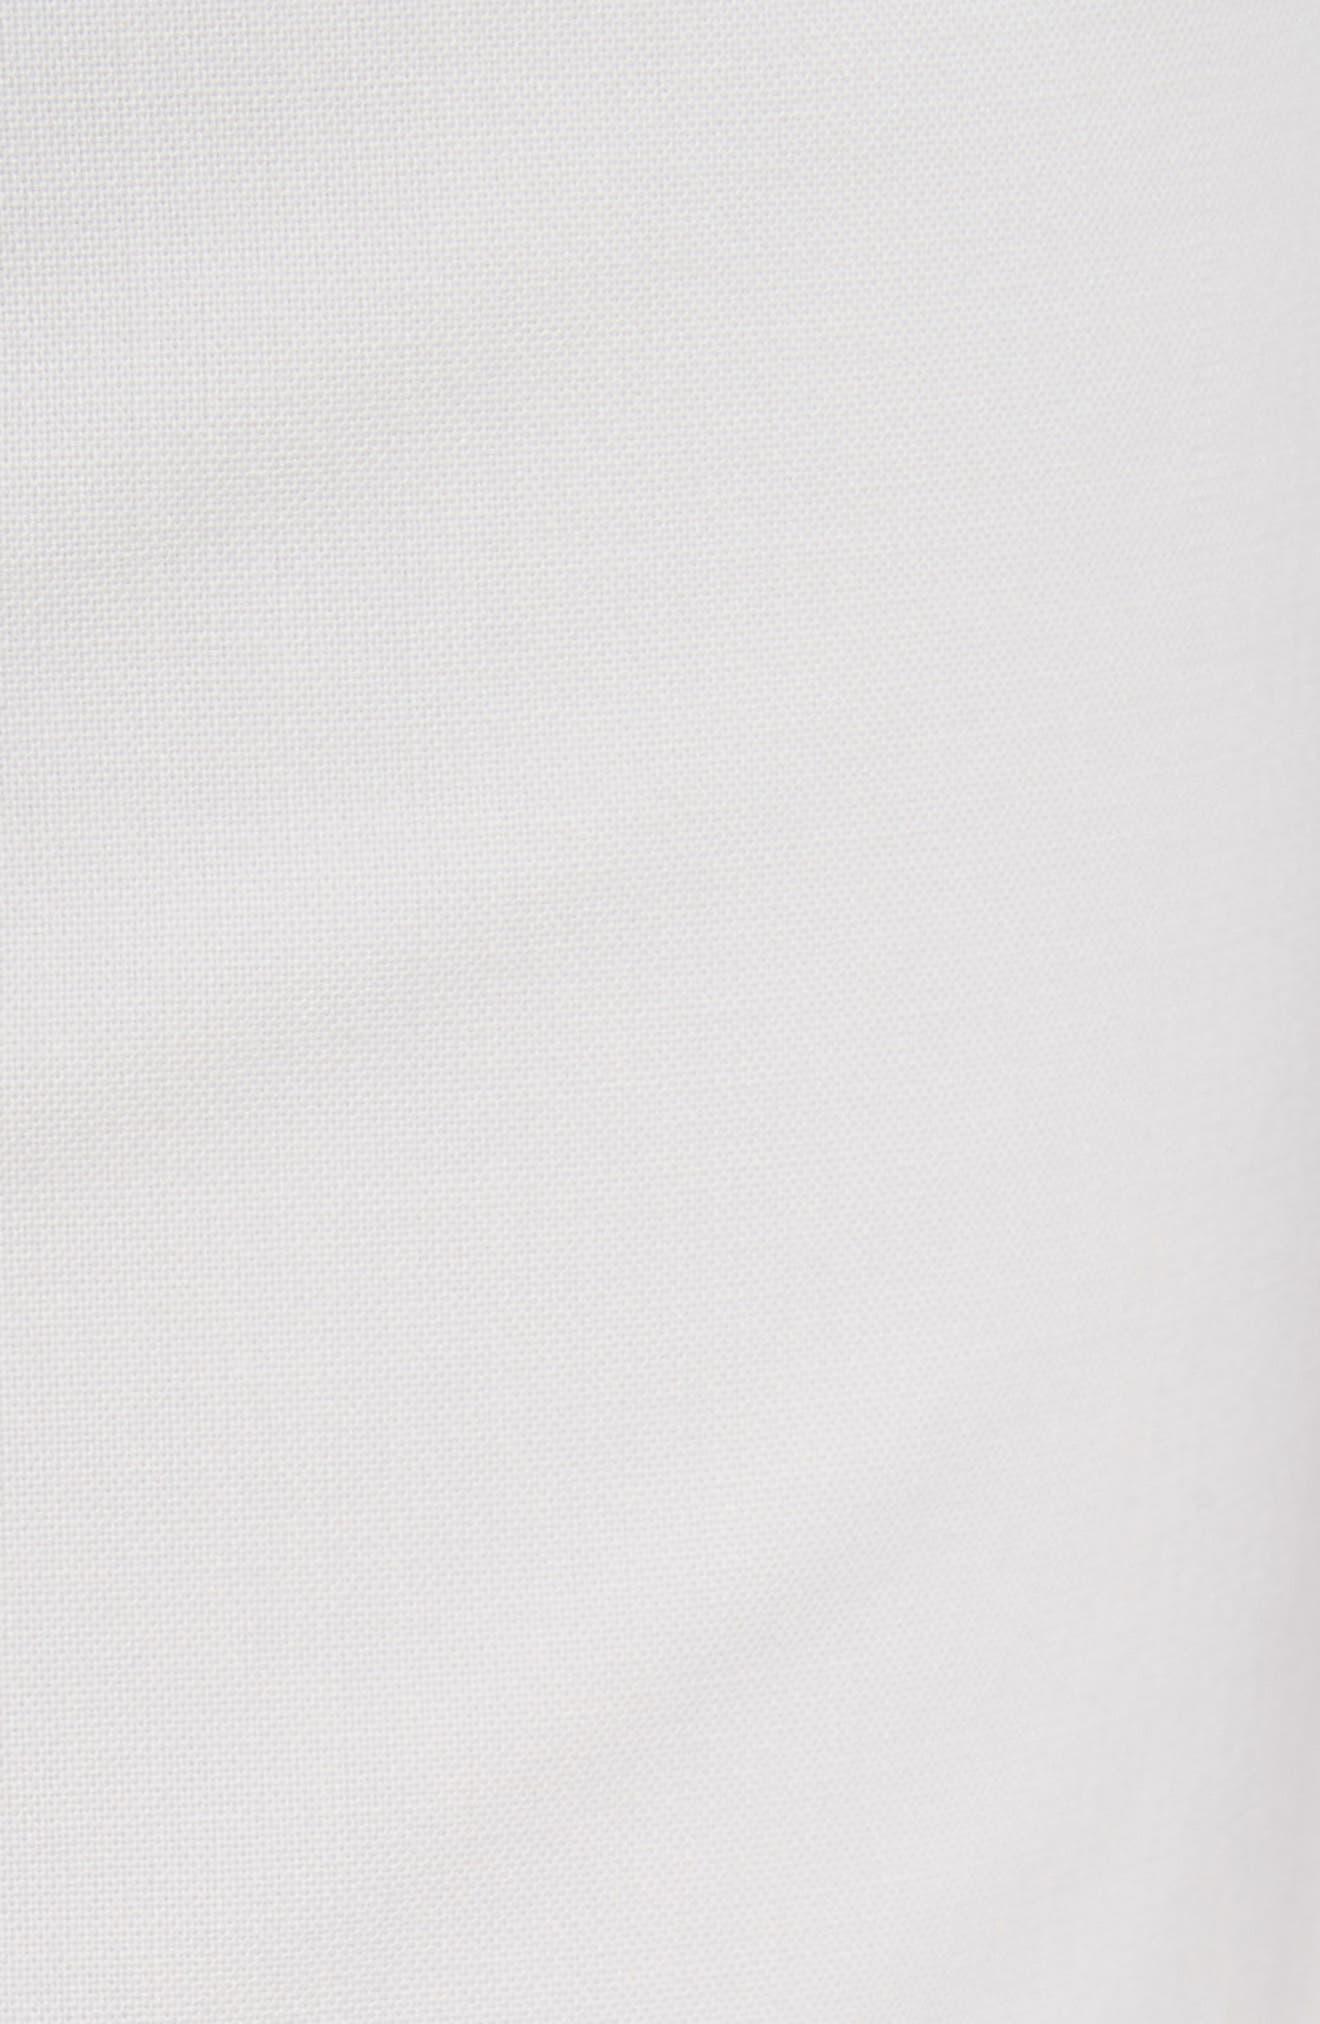 Demitria Polished Wool Pants,                             Alternate thumbnail 5, color,                             White